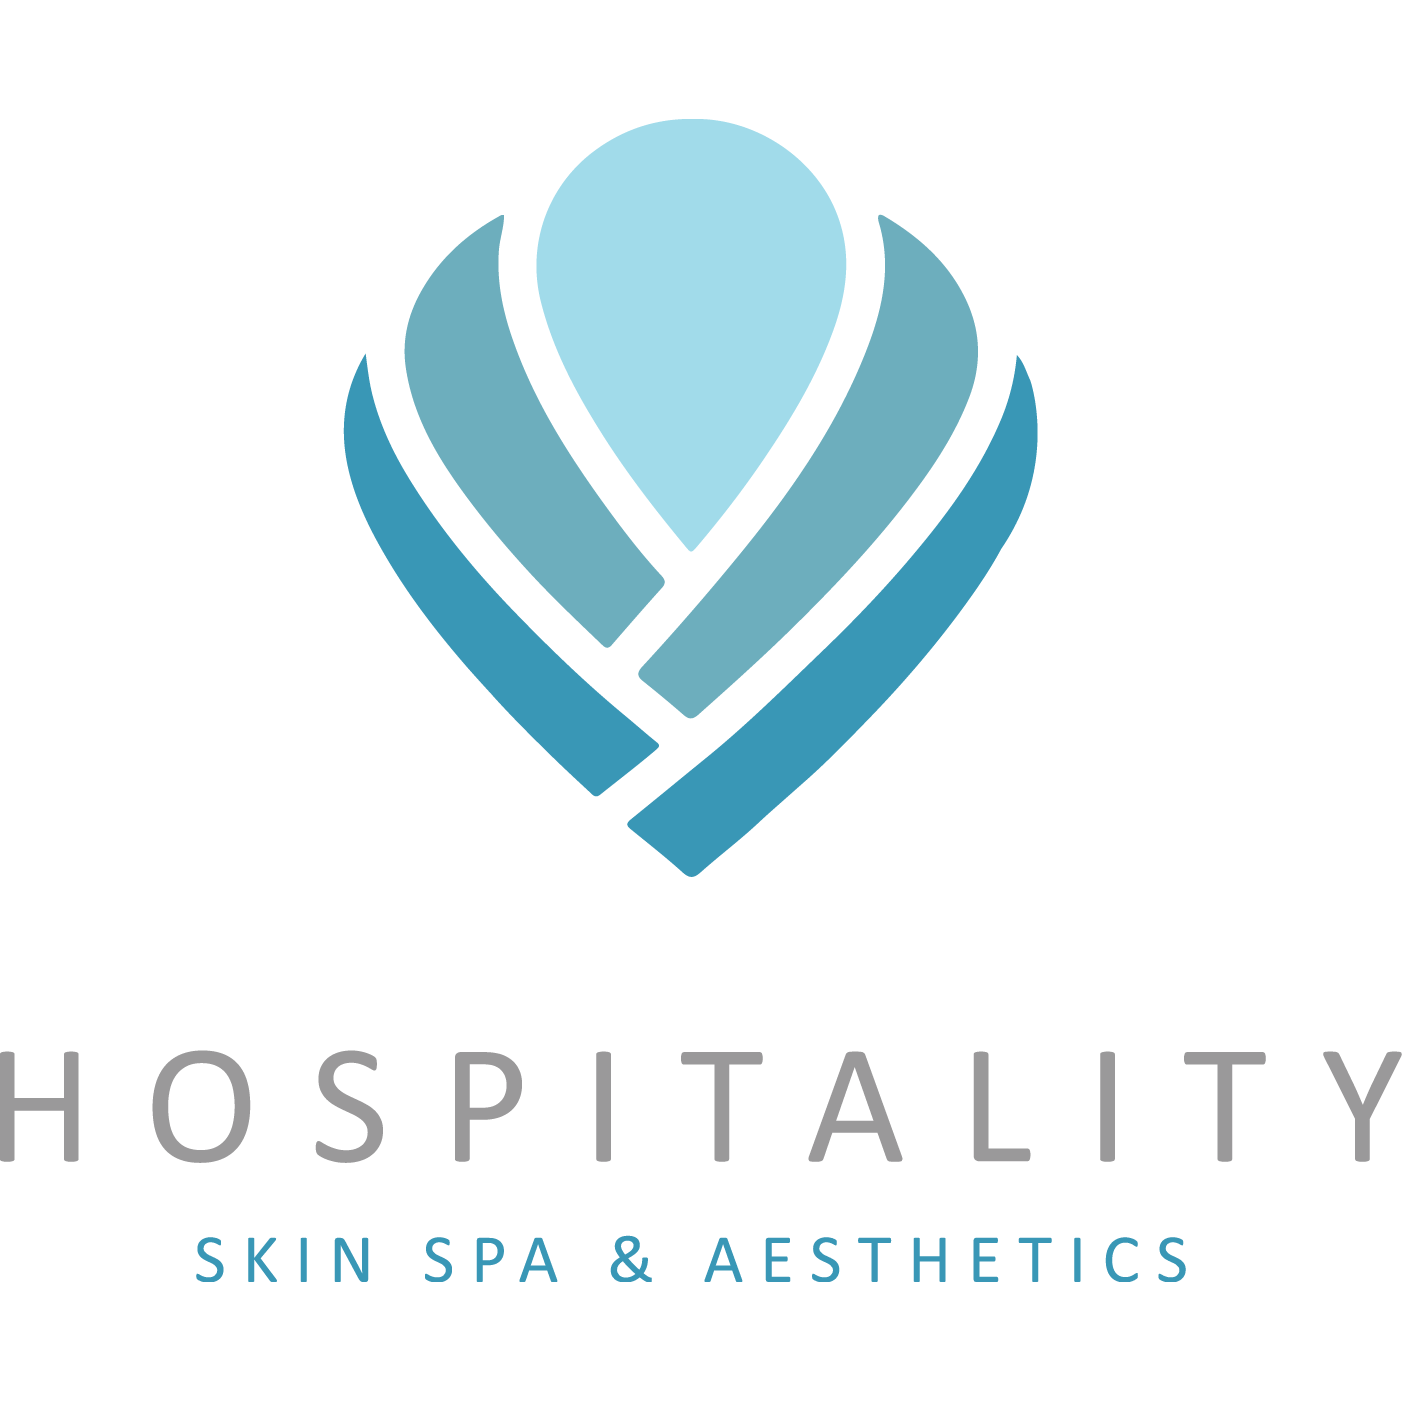 Hospitality Skin Spa & Aesthetics